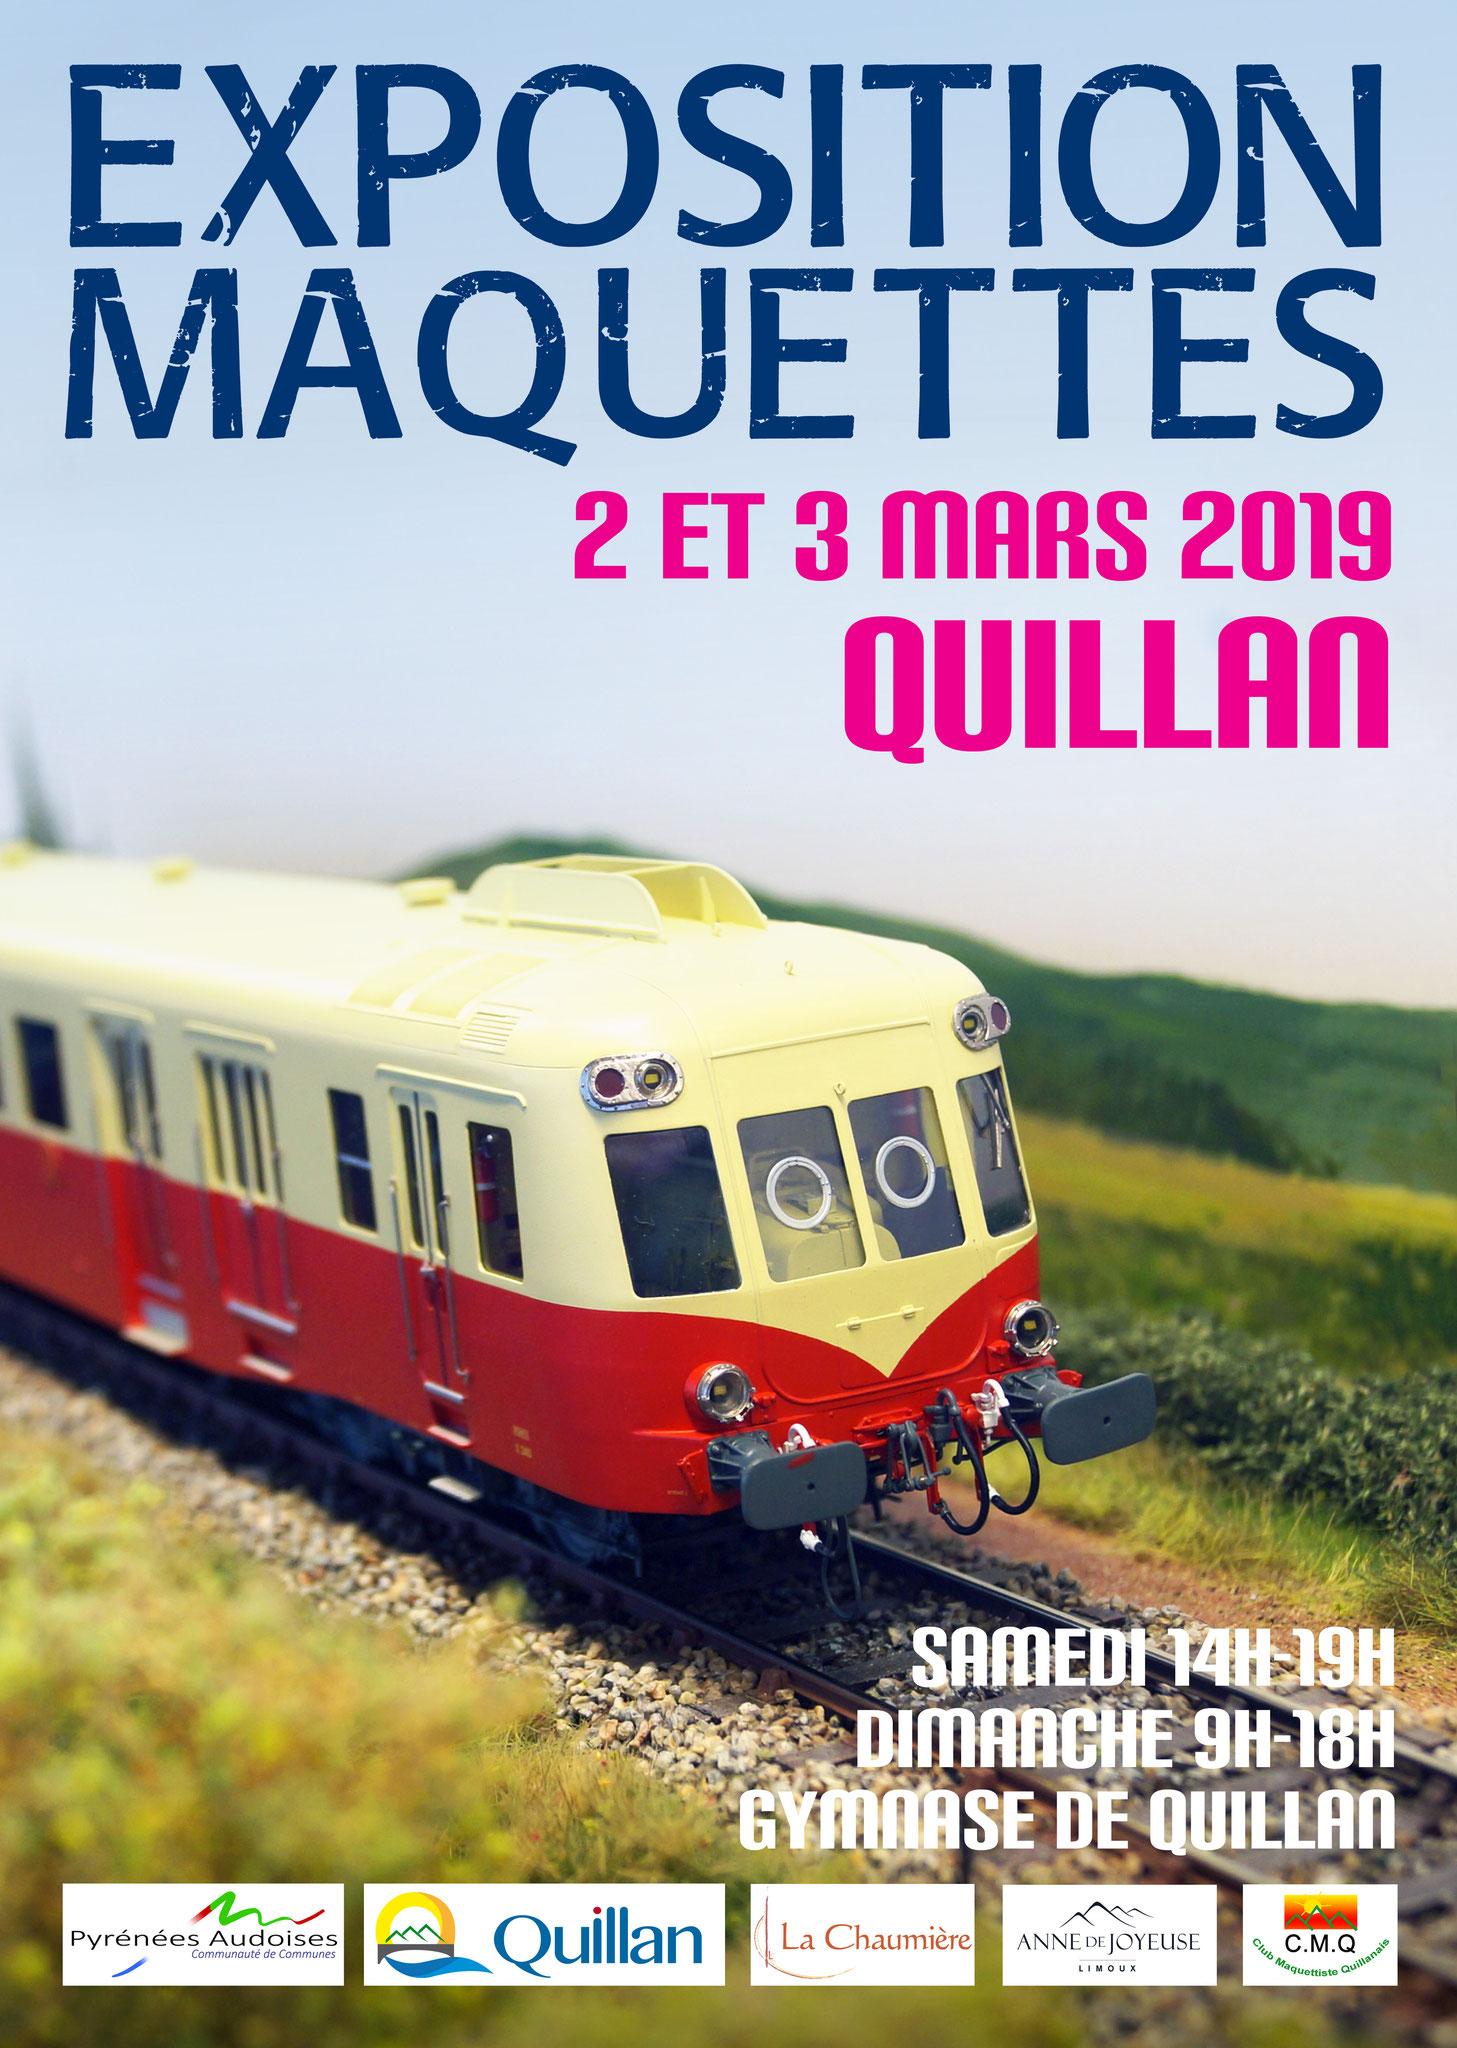 Calendrier Expo Maquette 2019.Expo Quillan 2019 Club Maquettiste Quillanais Site Officiel